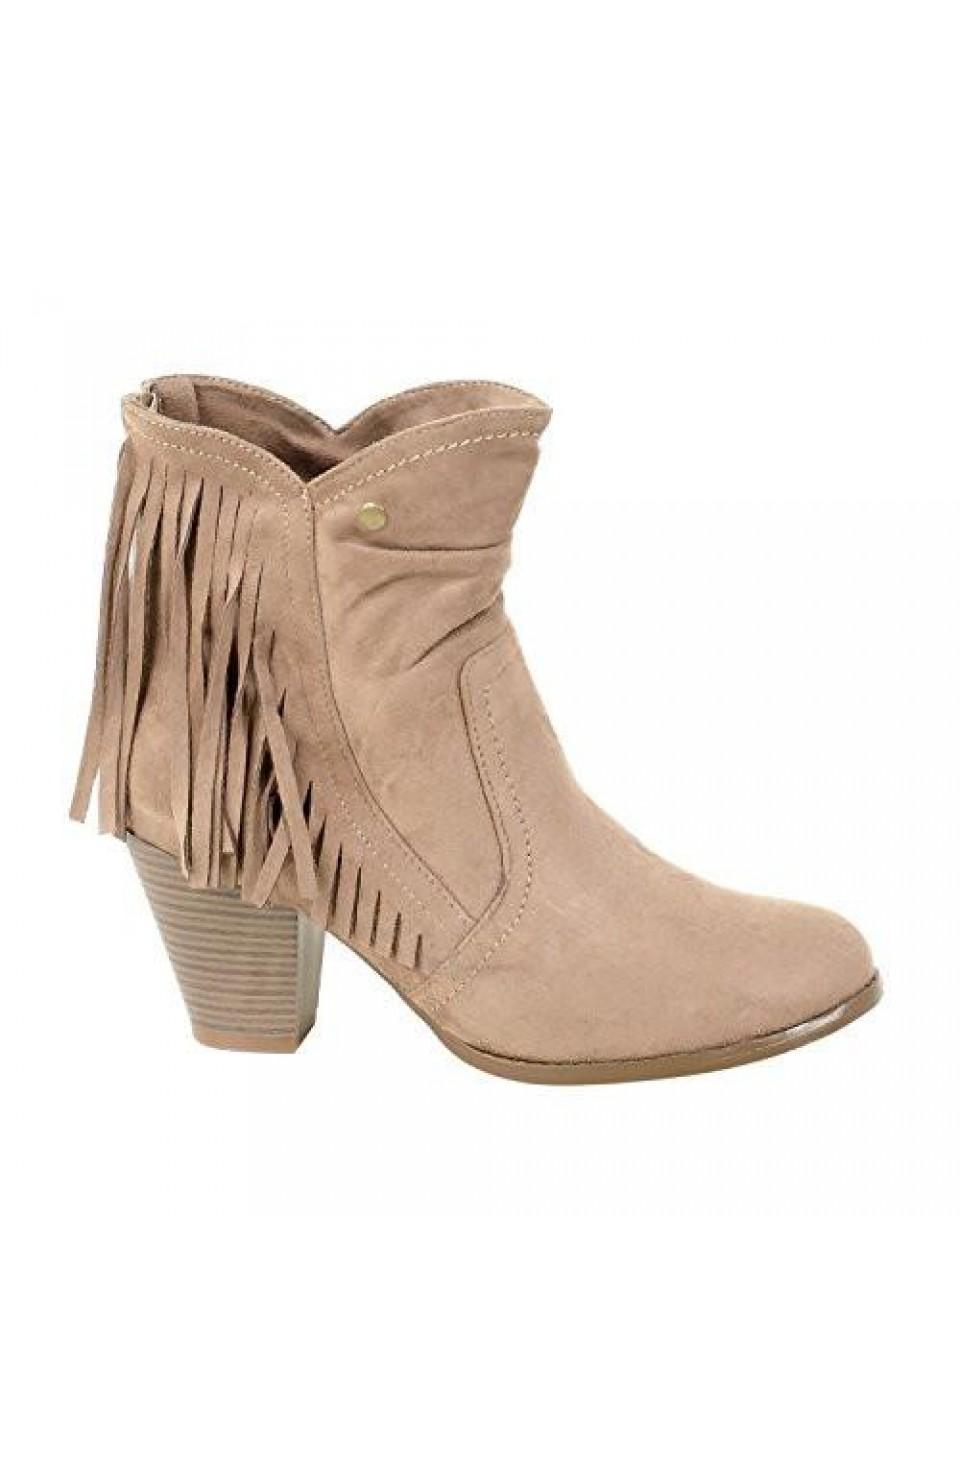 Women's Khaki Manmade Nickllenna 3-inch Heeled Boot with Western-Style Fringe